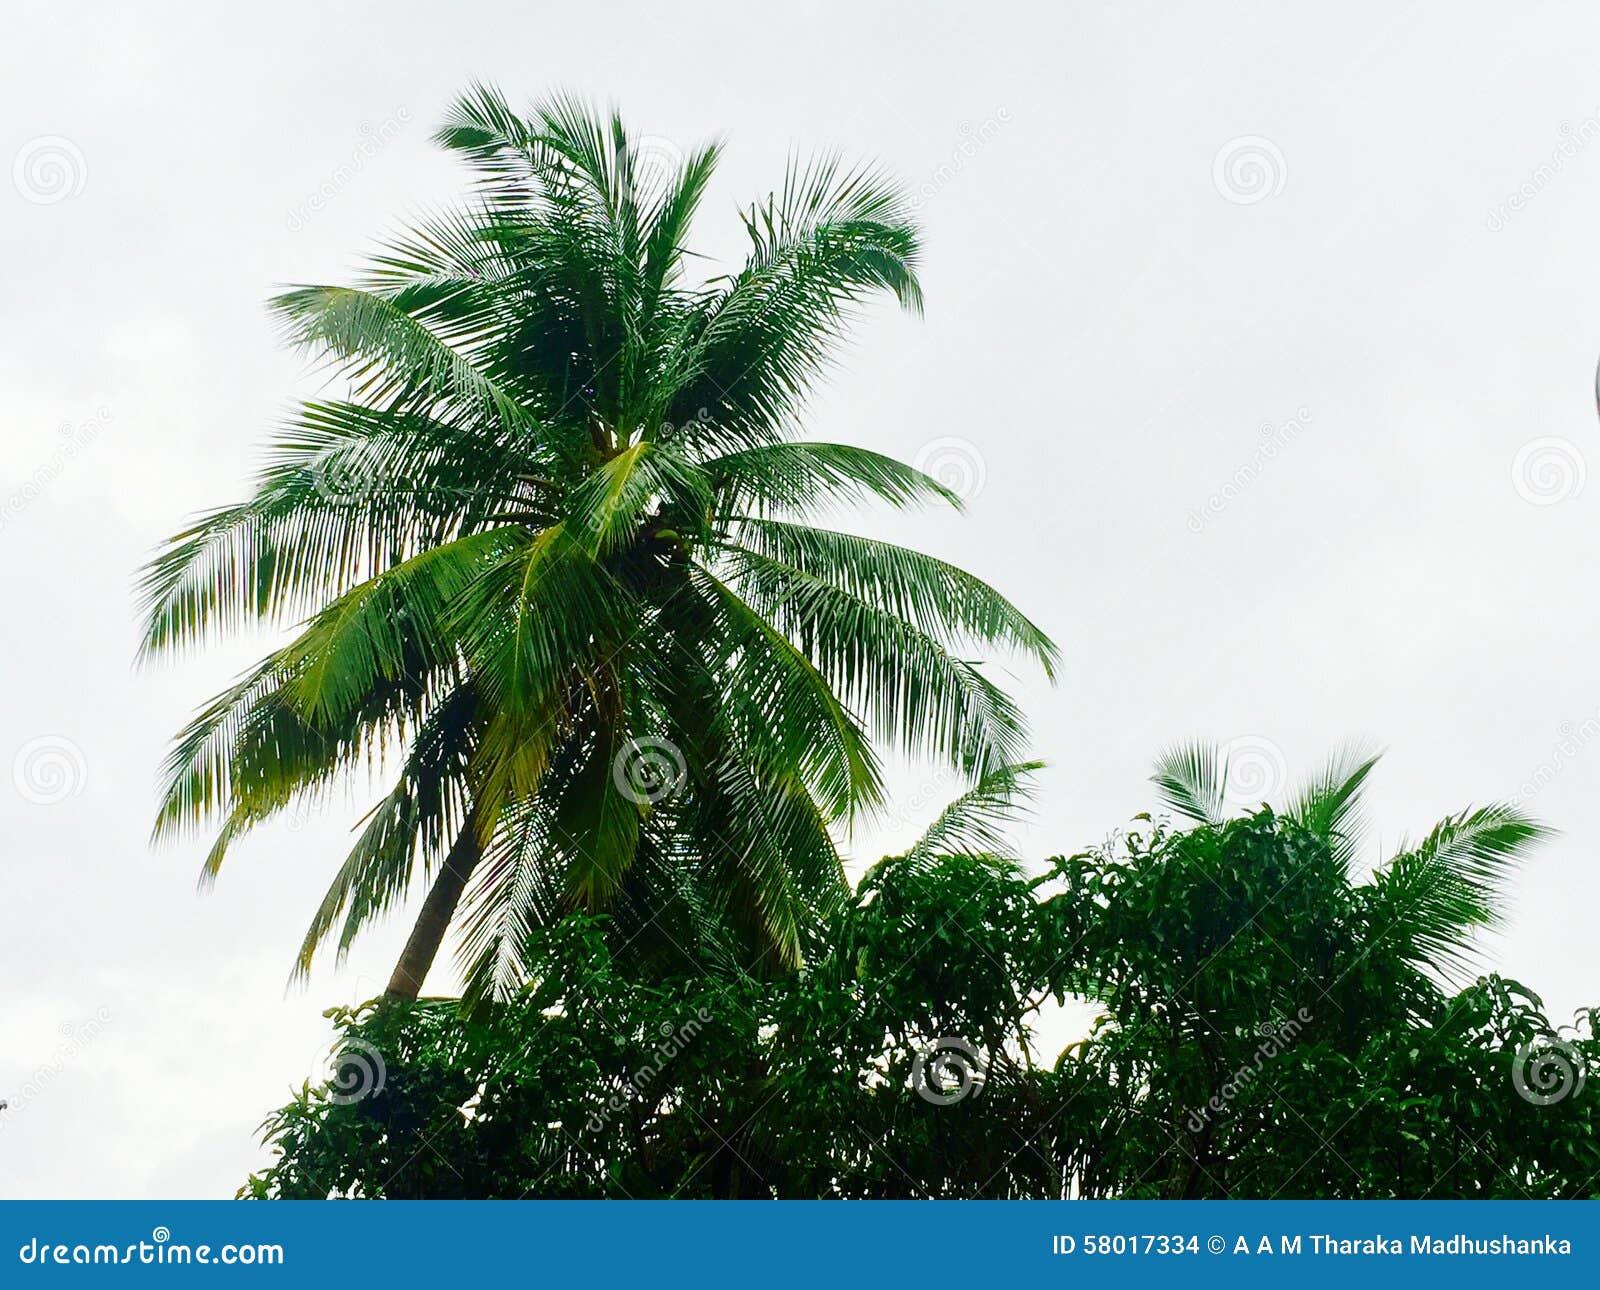 Kurunegala Sri Lanka  city photo : Coconut Tree Stock Photo Image: 58017334